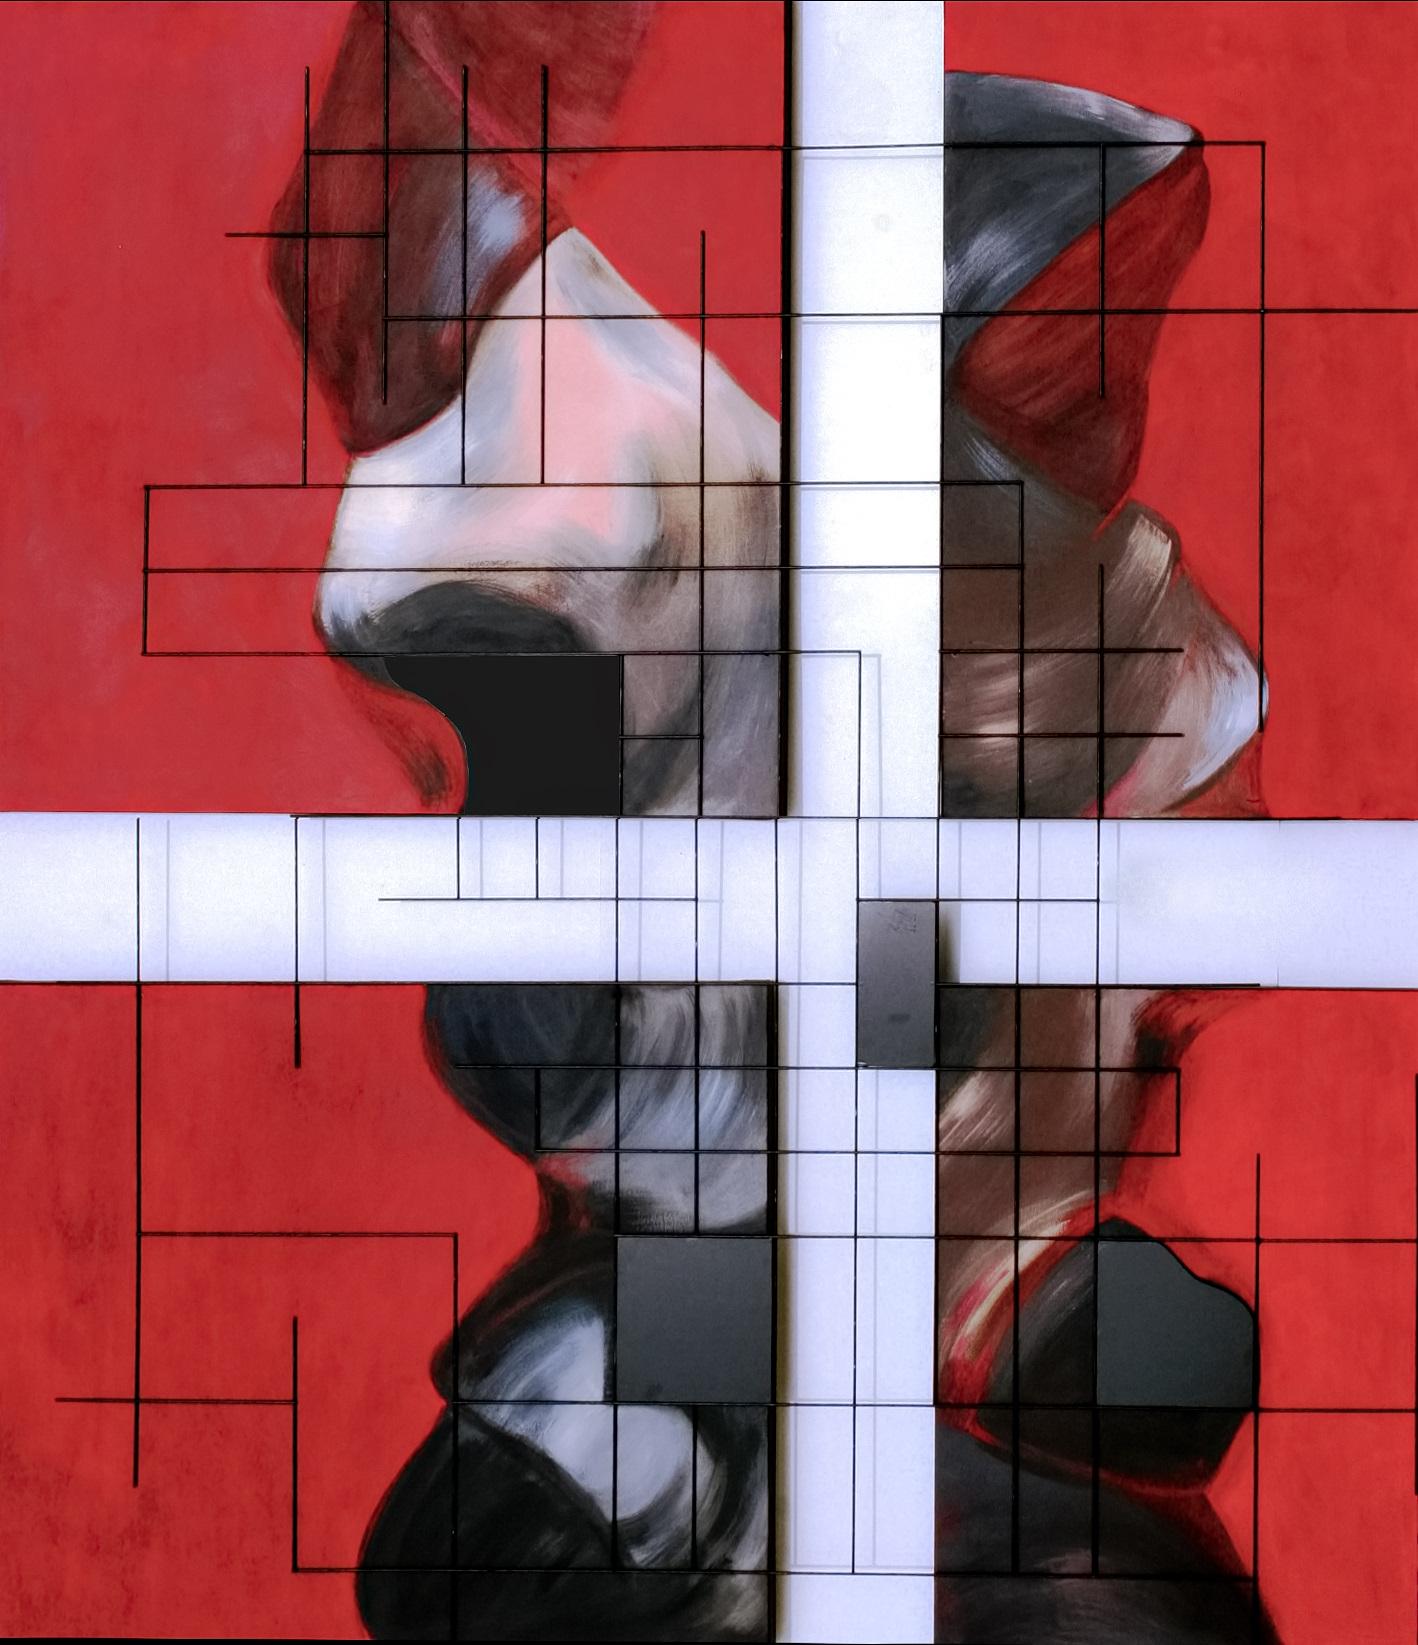 ESTRUCTURA DE L'ESTRUCTURA DE LA MEMÒRIA (2016) - Ade Marcos Lopez